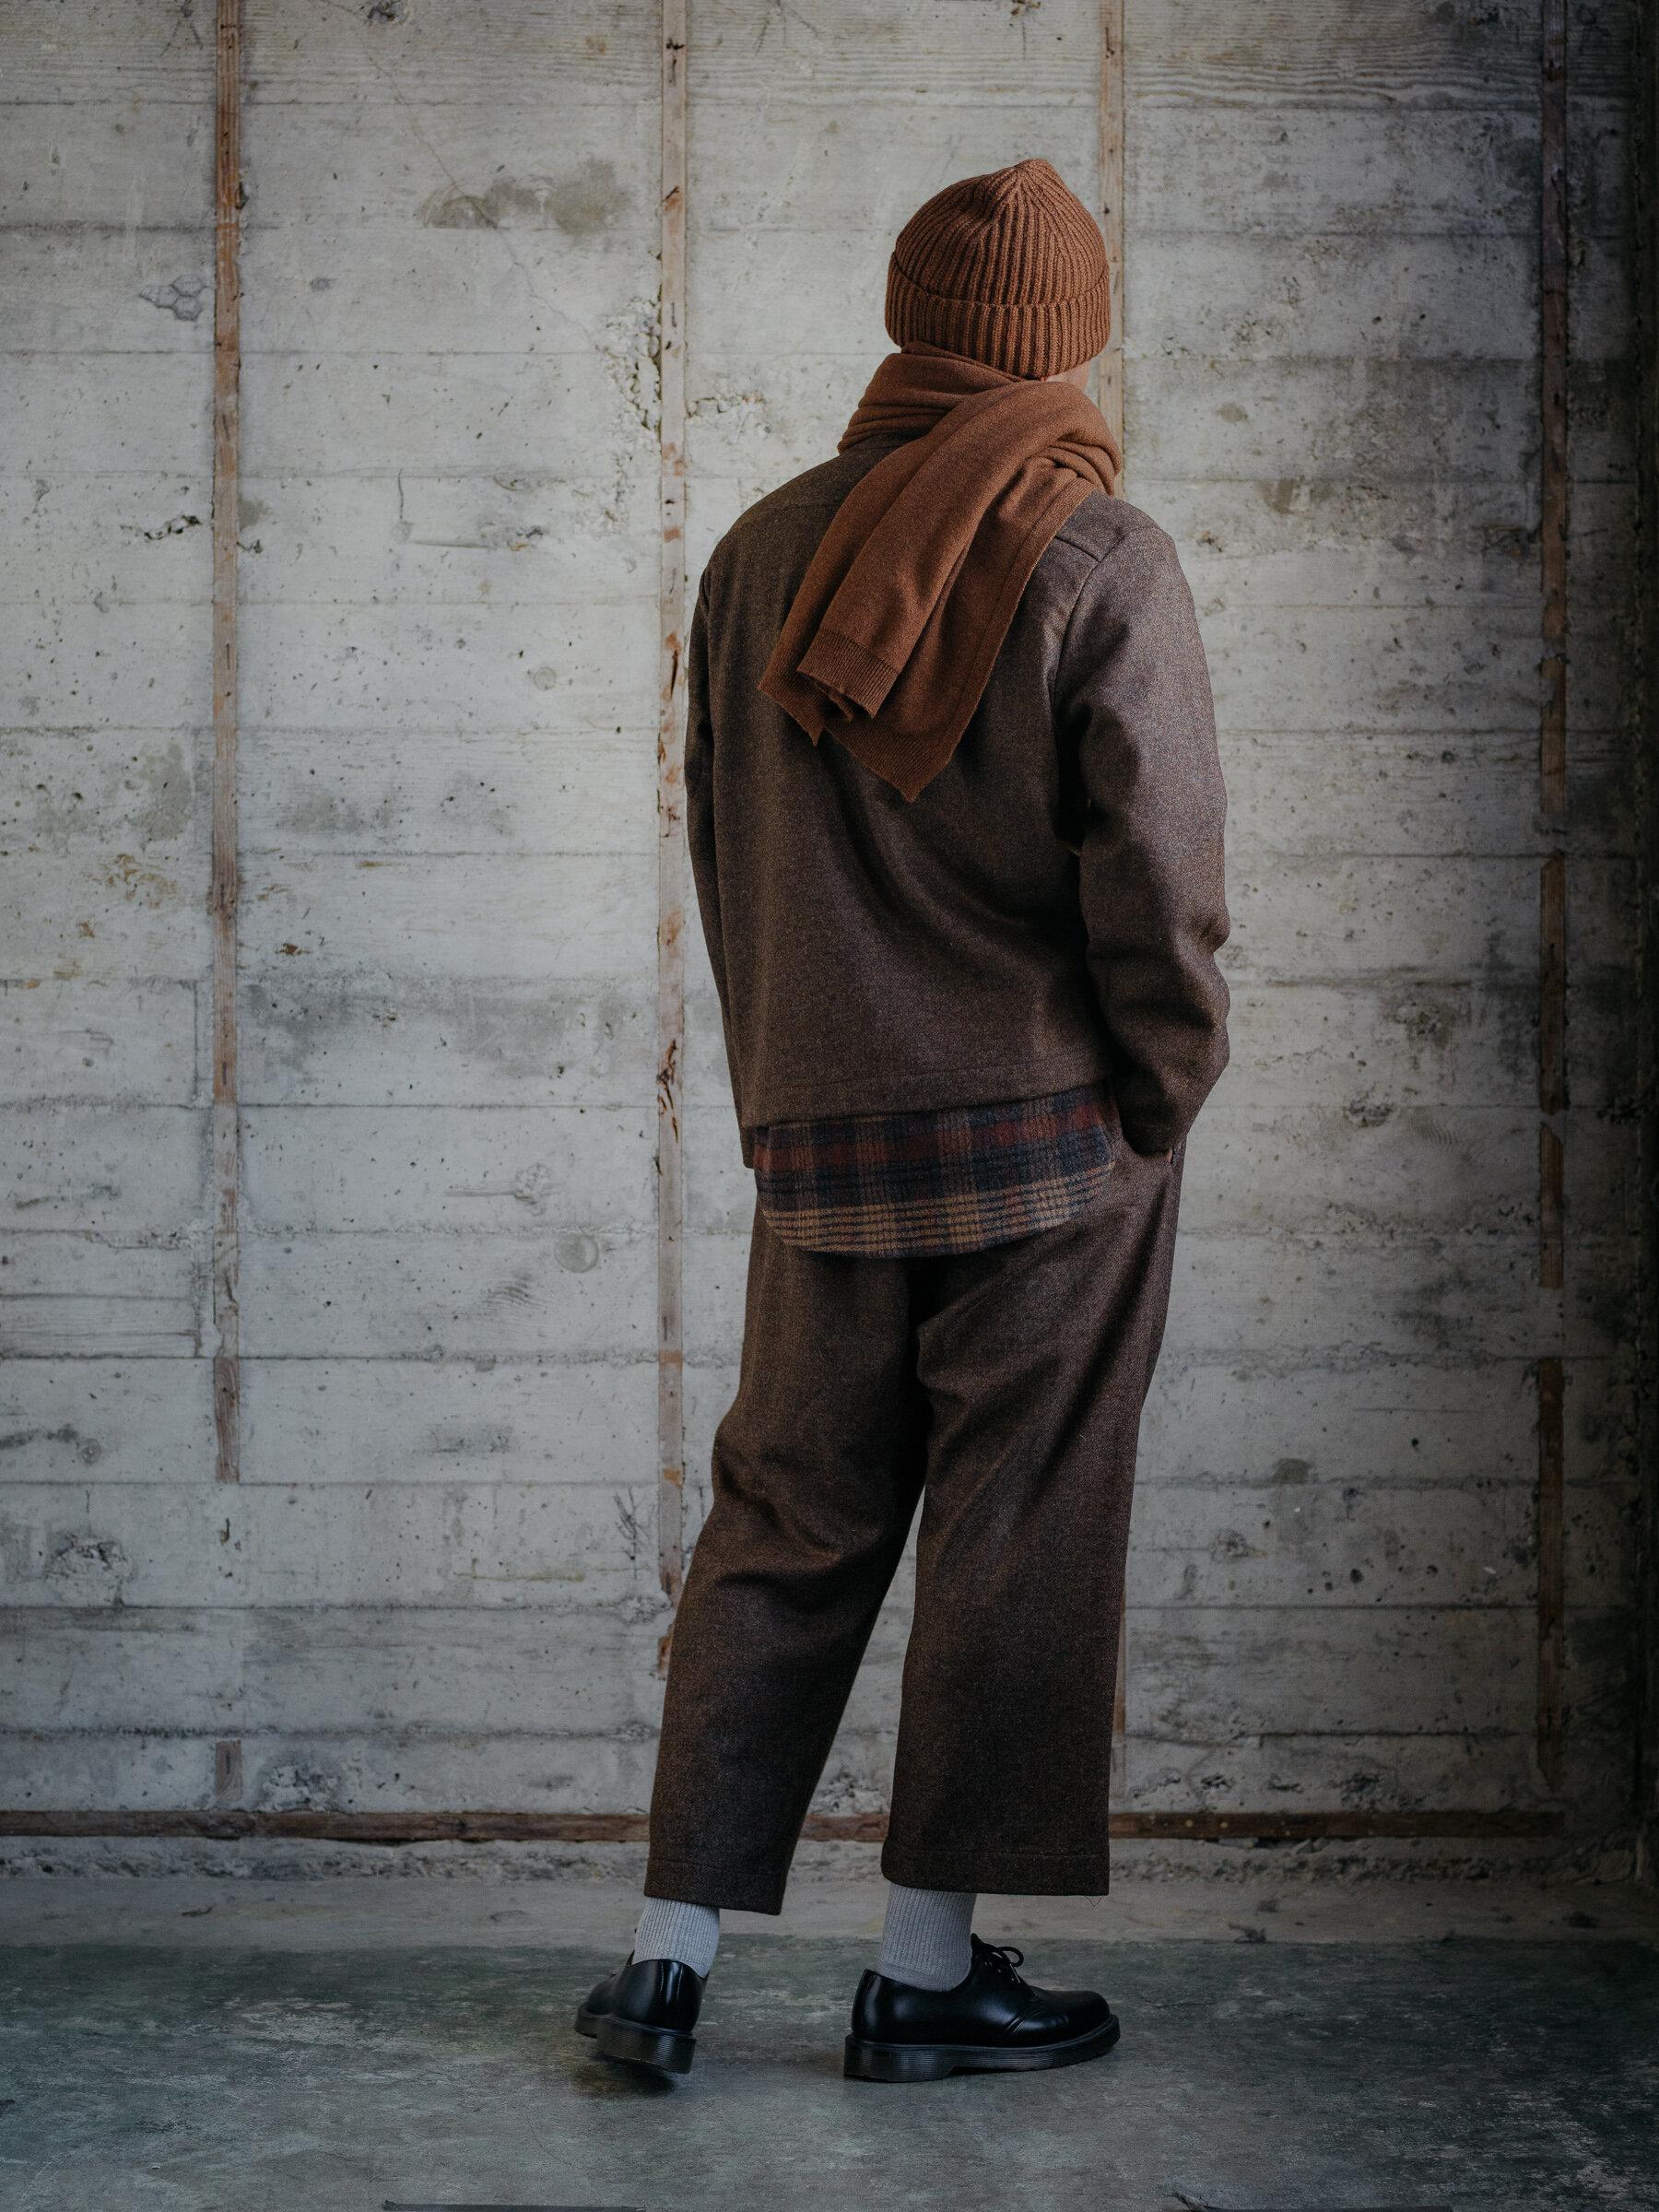 evan-kinori-knit-shawl-cashmere-lambswool-made-in-italy-2